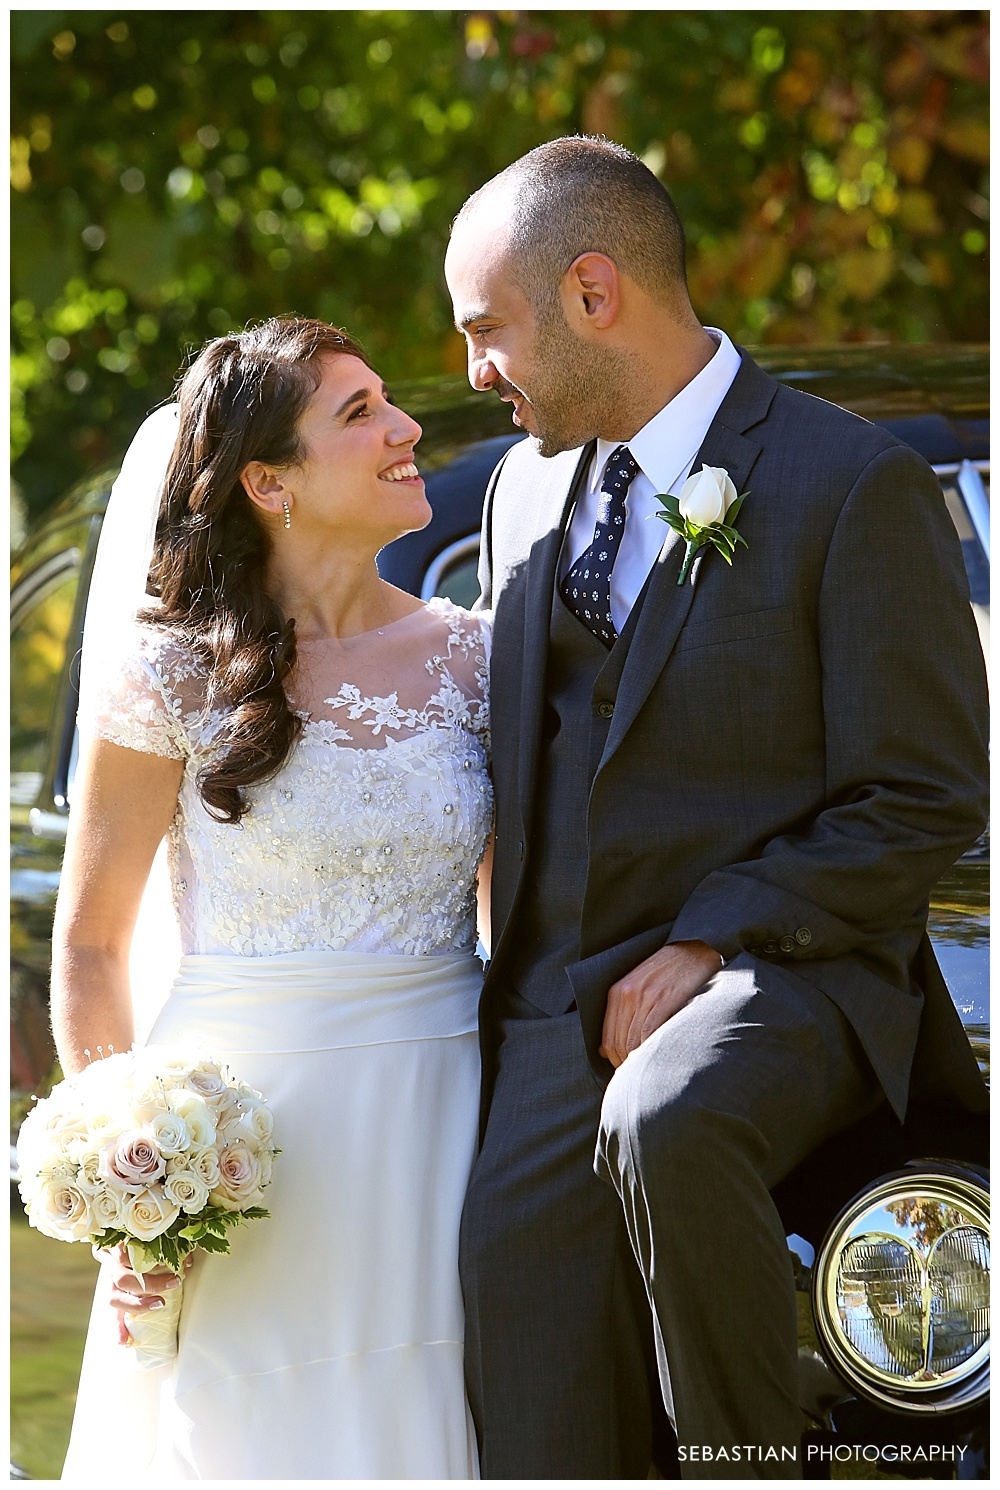 Sebastian_Photography_Studio_Wedding_Connecticut_Bride_Groom_Backyard_Fall_Autumn_NewEngland_035.jpg